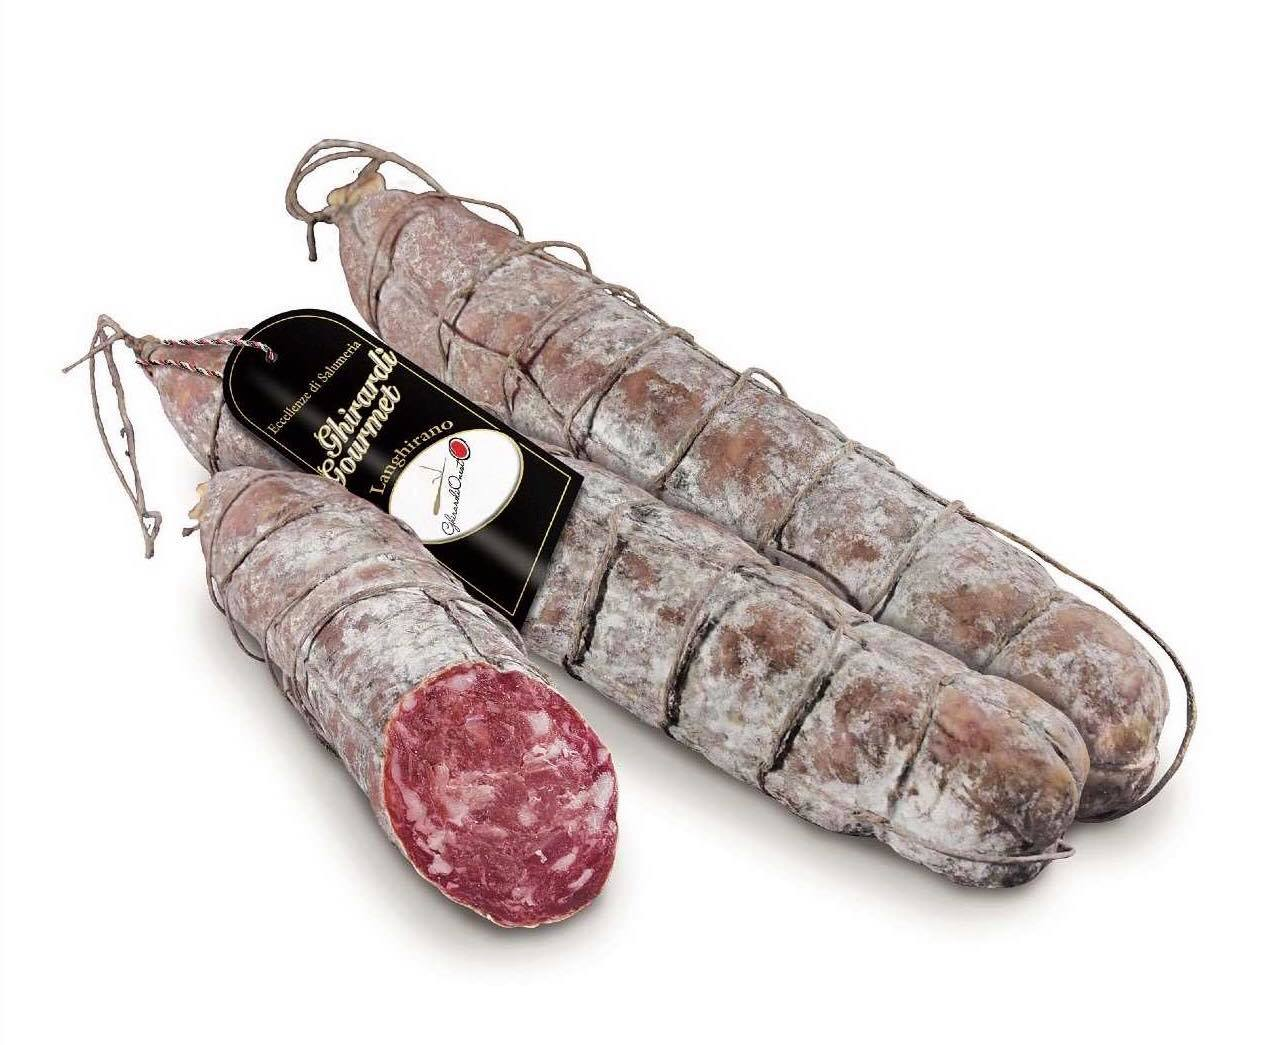 Felino salami - Ghirardi Onesto